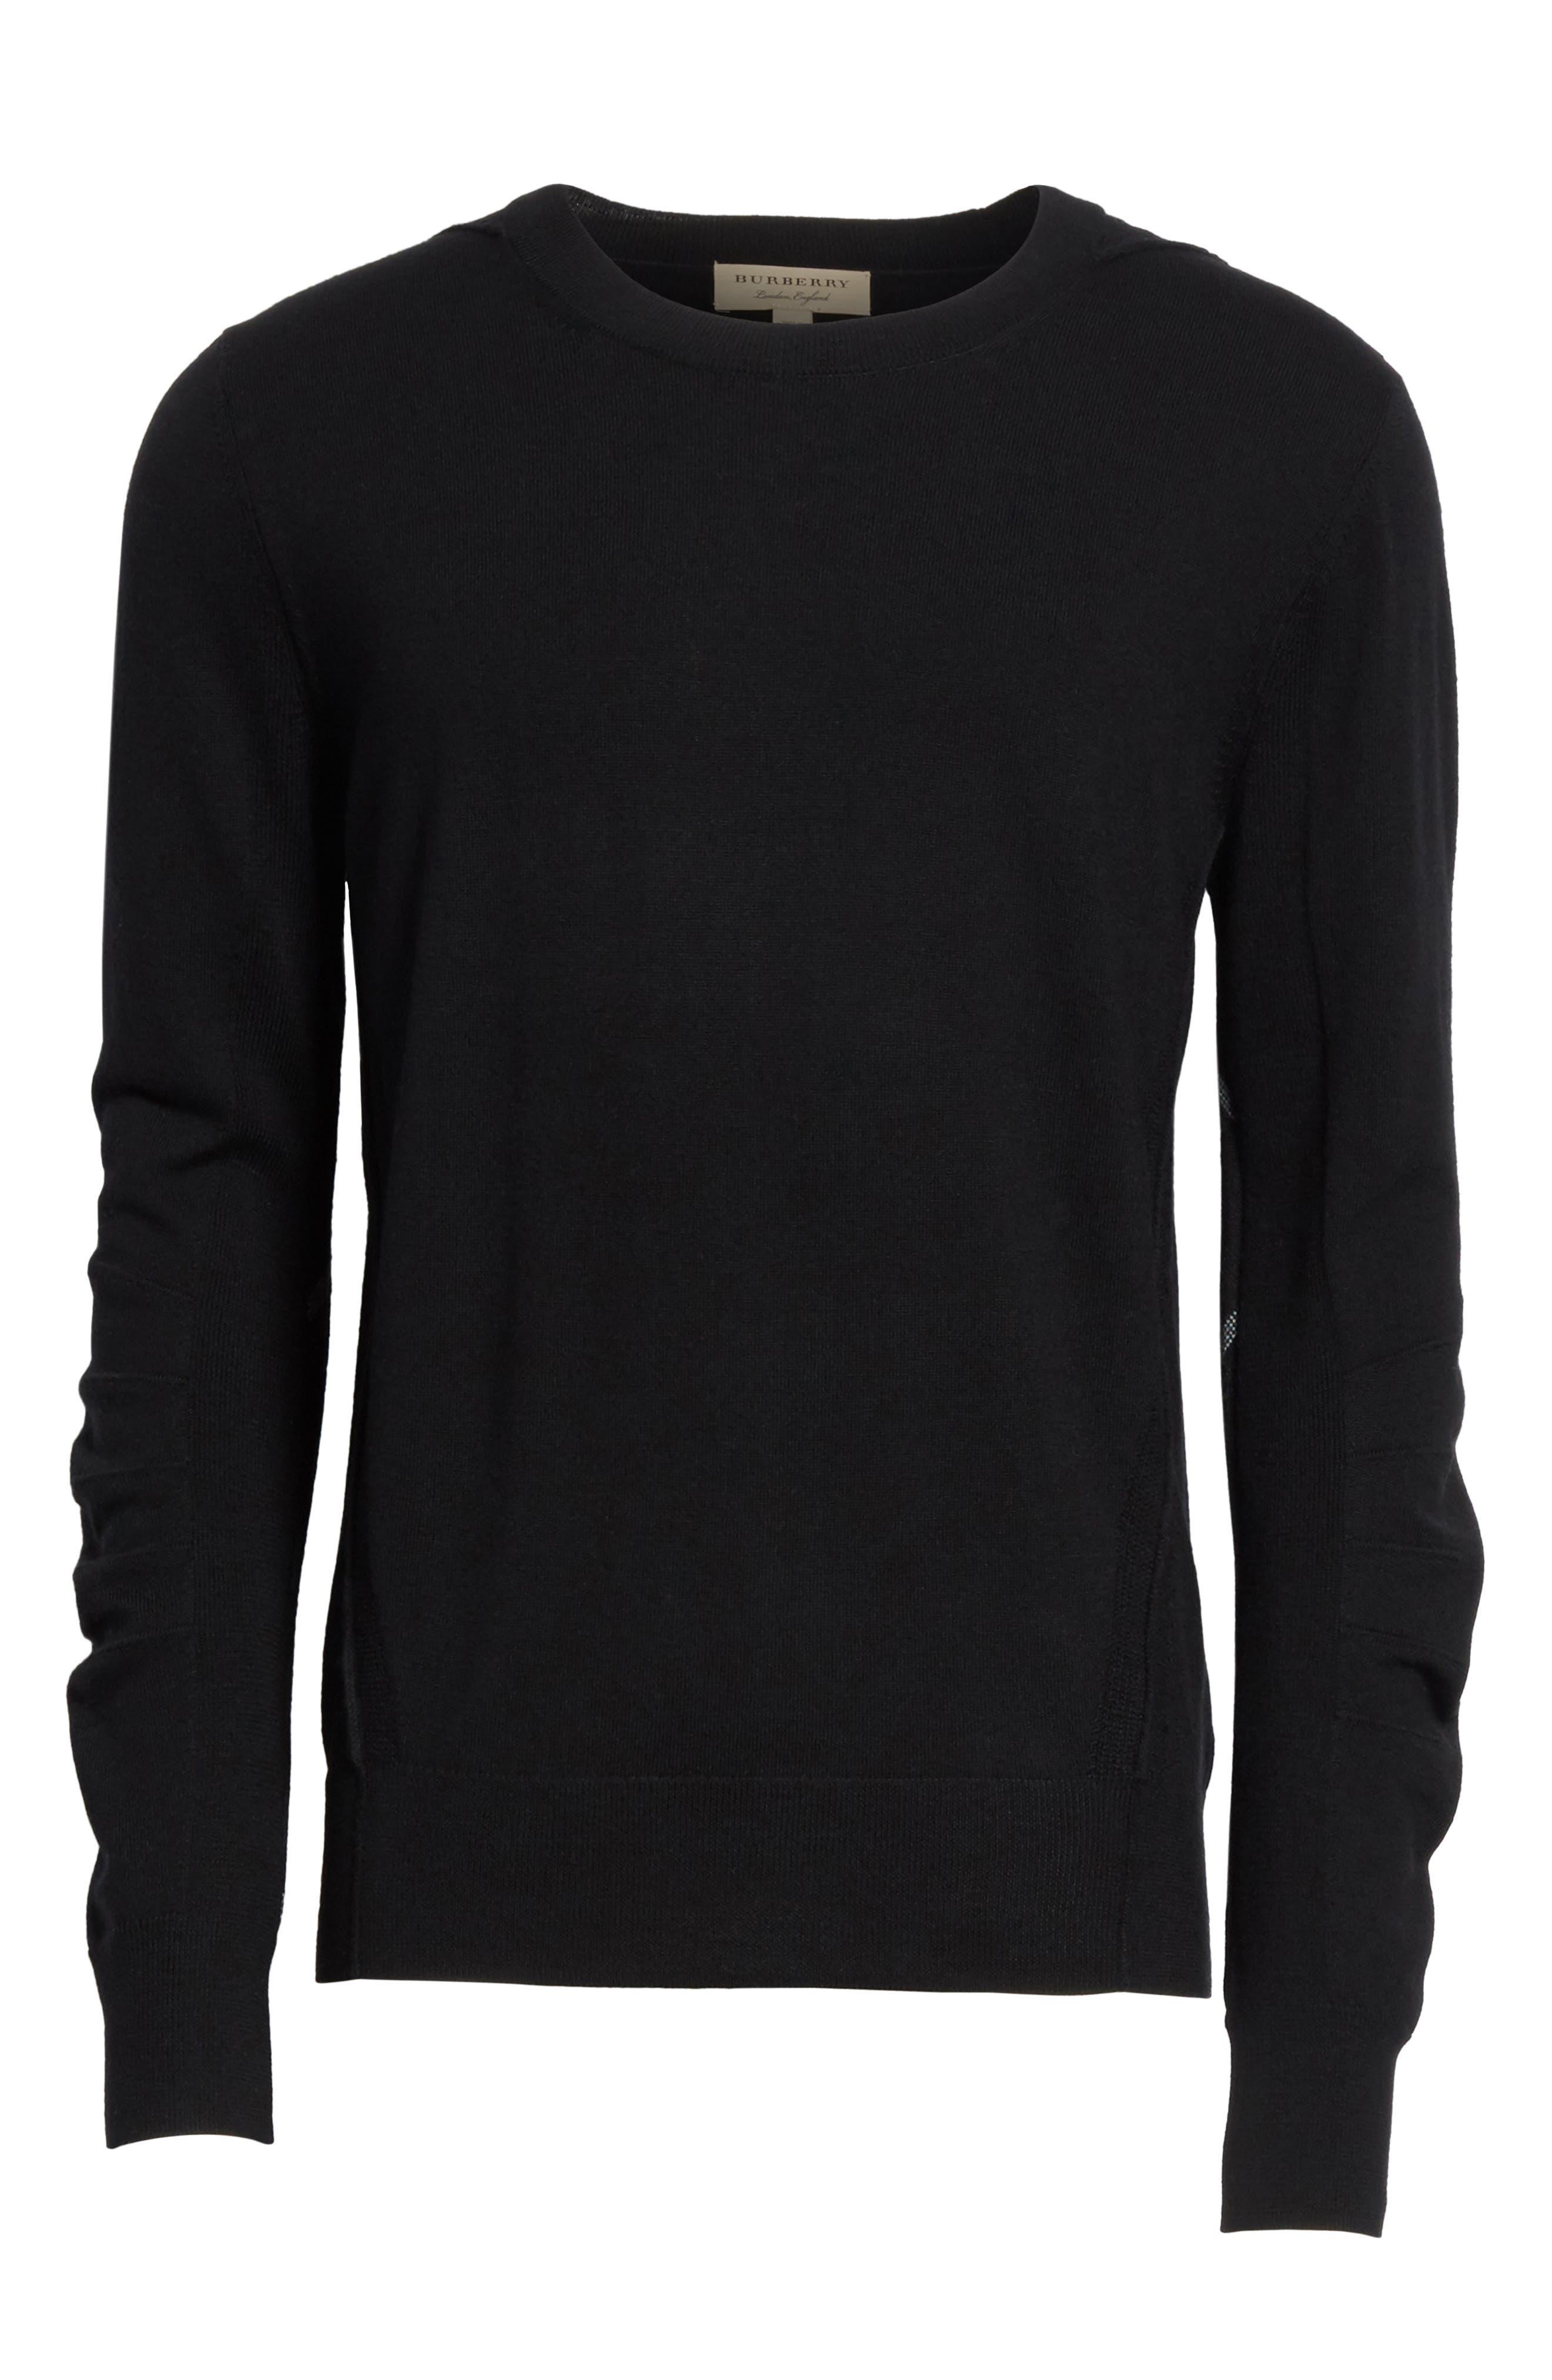 Carter Merino Wool Crewneck Sweater,                             Alternate thumbnail 6, color,                             BLACK